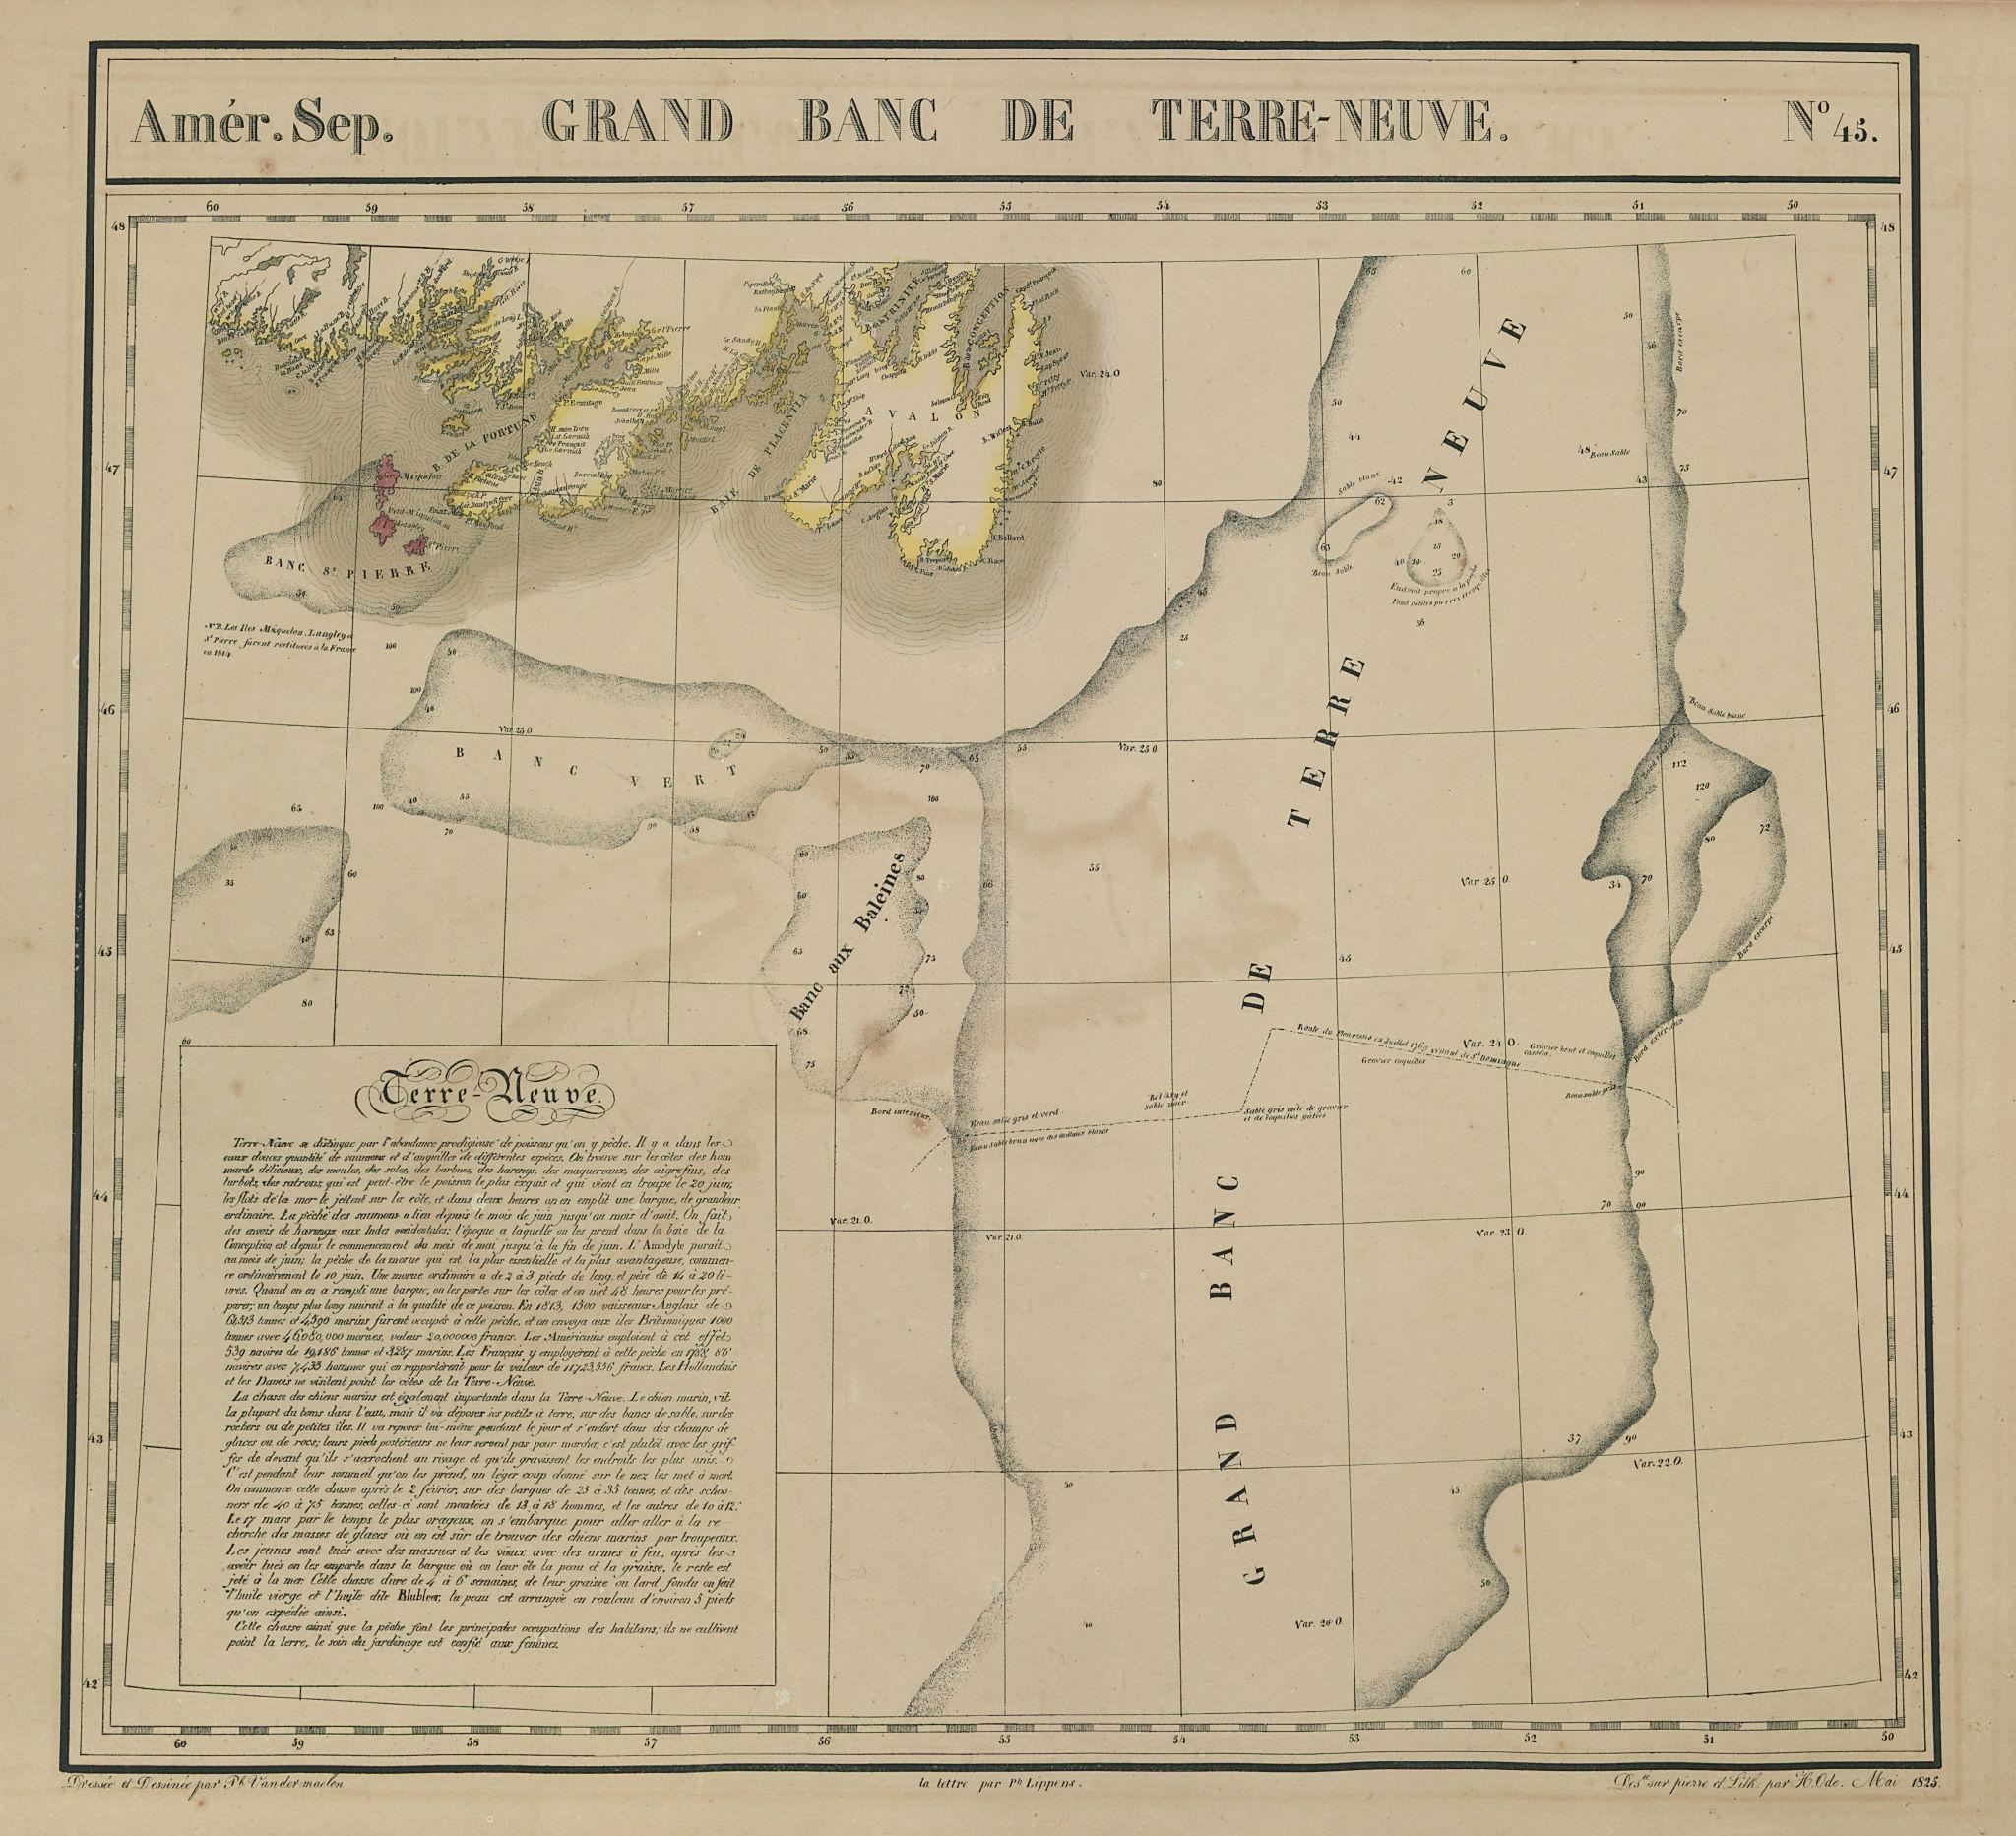 Amér. Sep. Grand Banc de Terre-Neuve #45. Newfoundland. VANDERMAELEN 1827 map